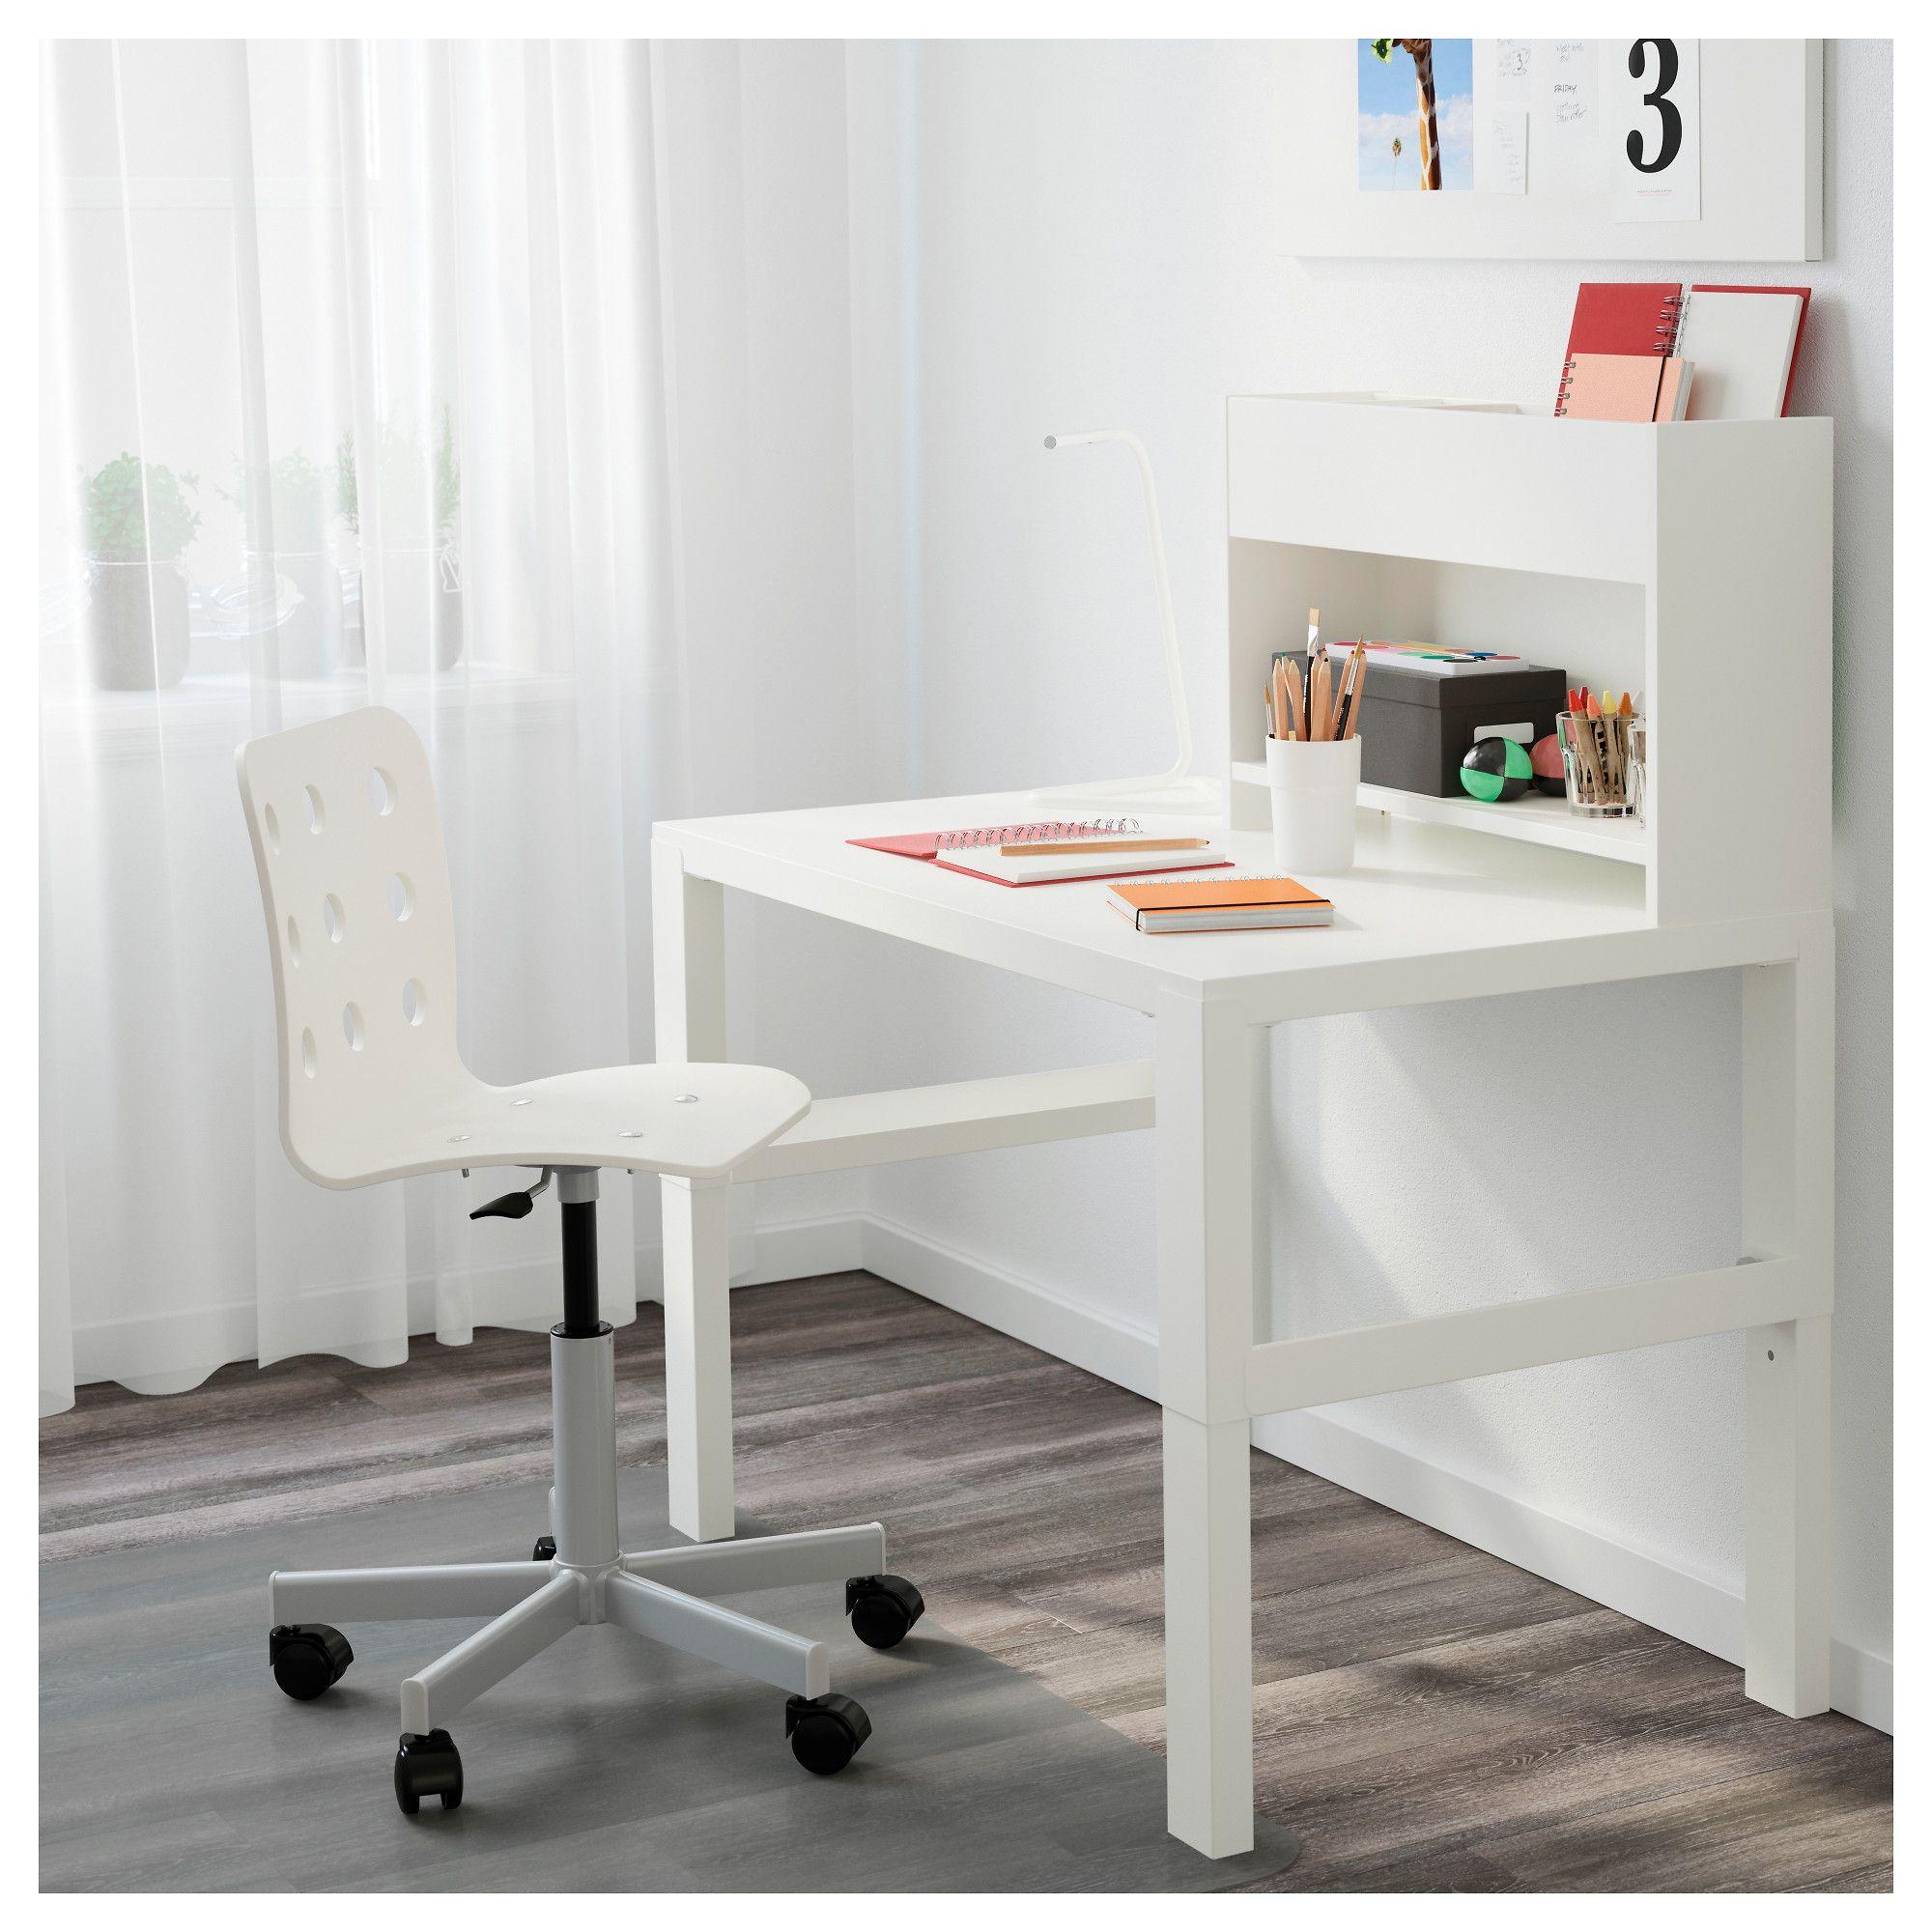 PÅHL white, Desk with addon unit, 96x58 cm IKEA Ikea